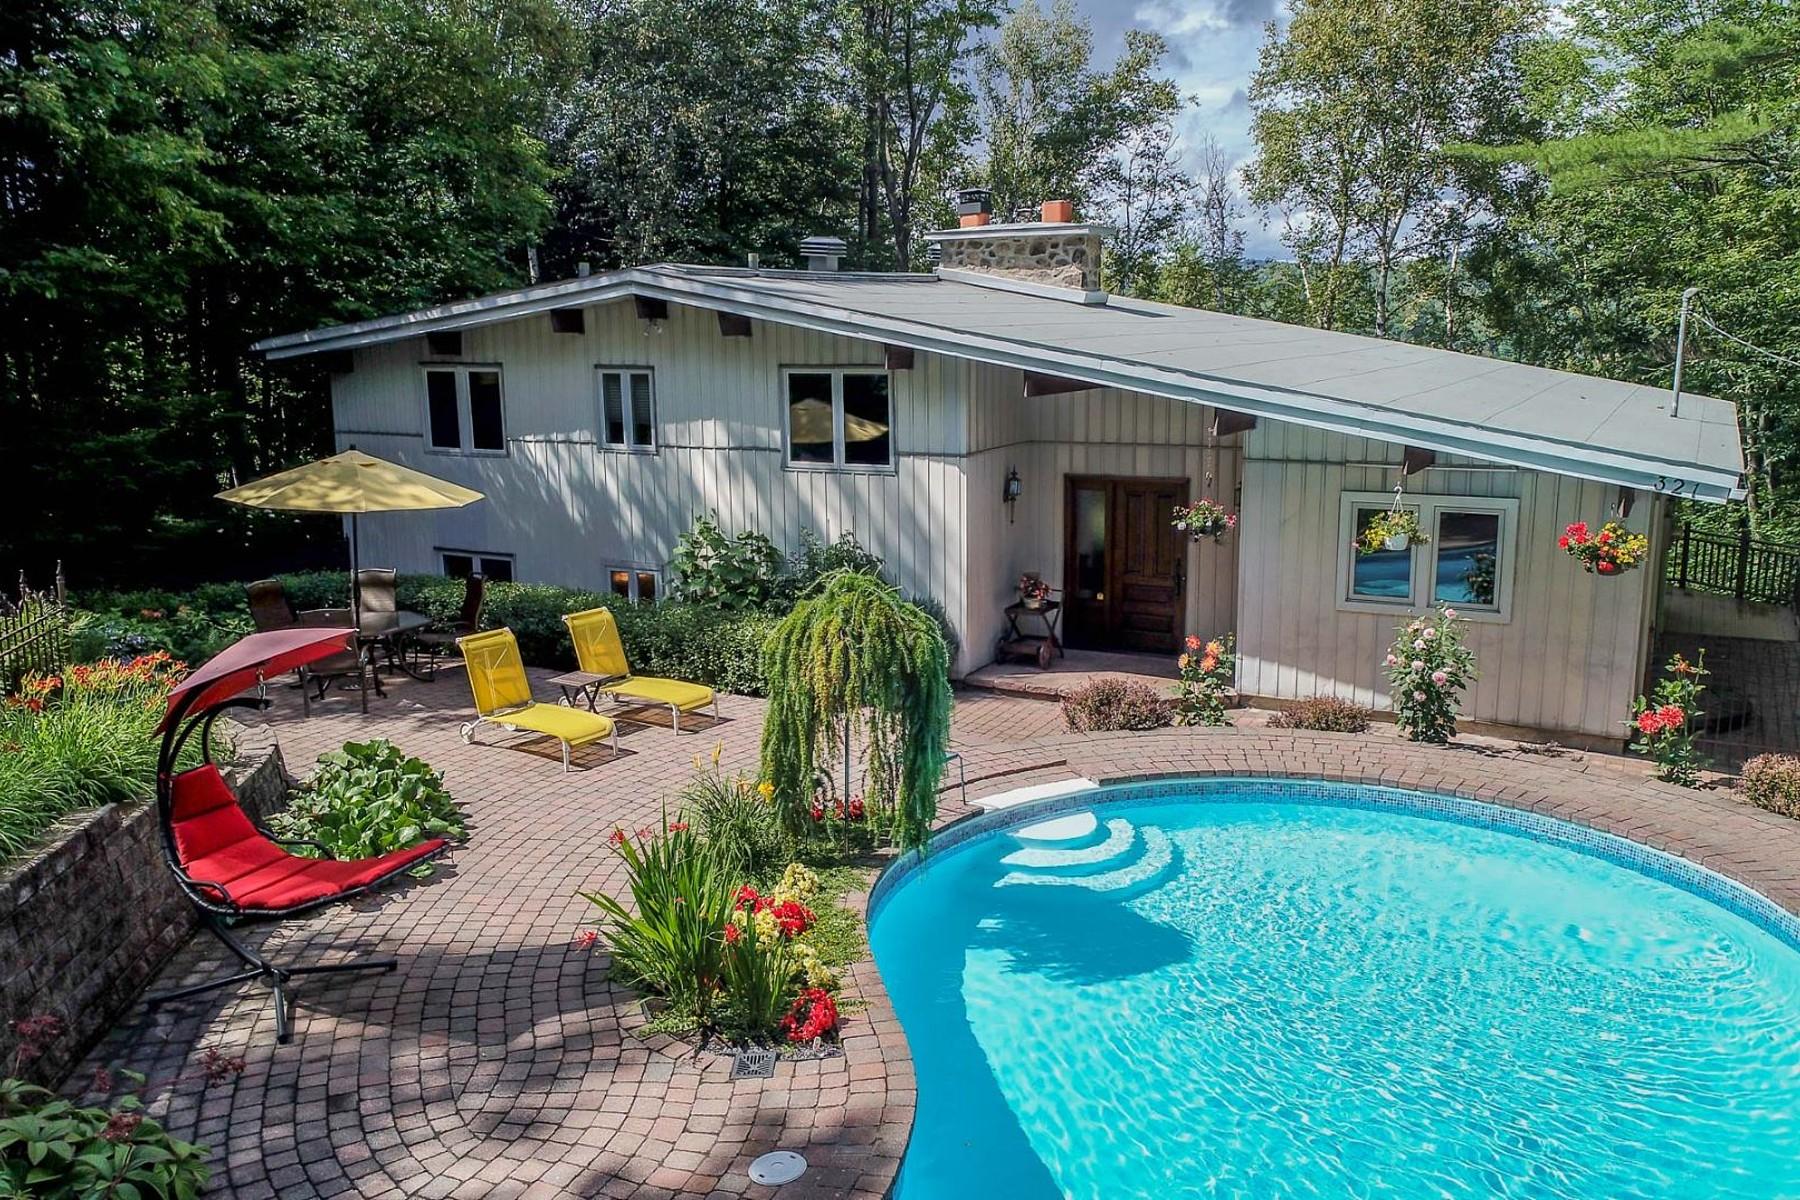 Single Family Homes for Sale at Sainte-Adèle, Laurentides 321 Rue du Hêtre Sainte-Adele, Quebec J8B2S8 Canada